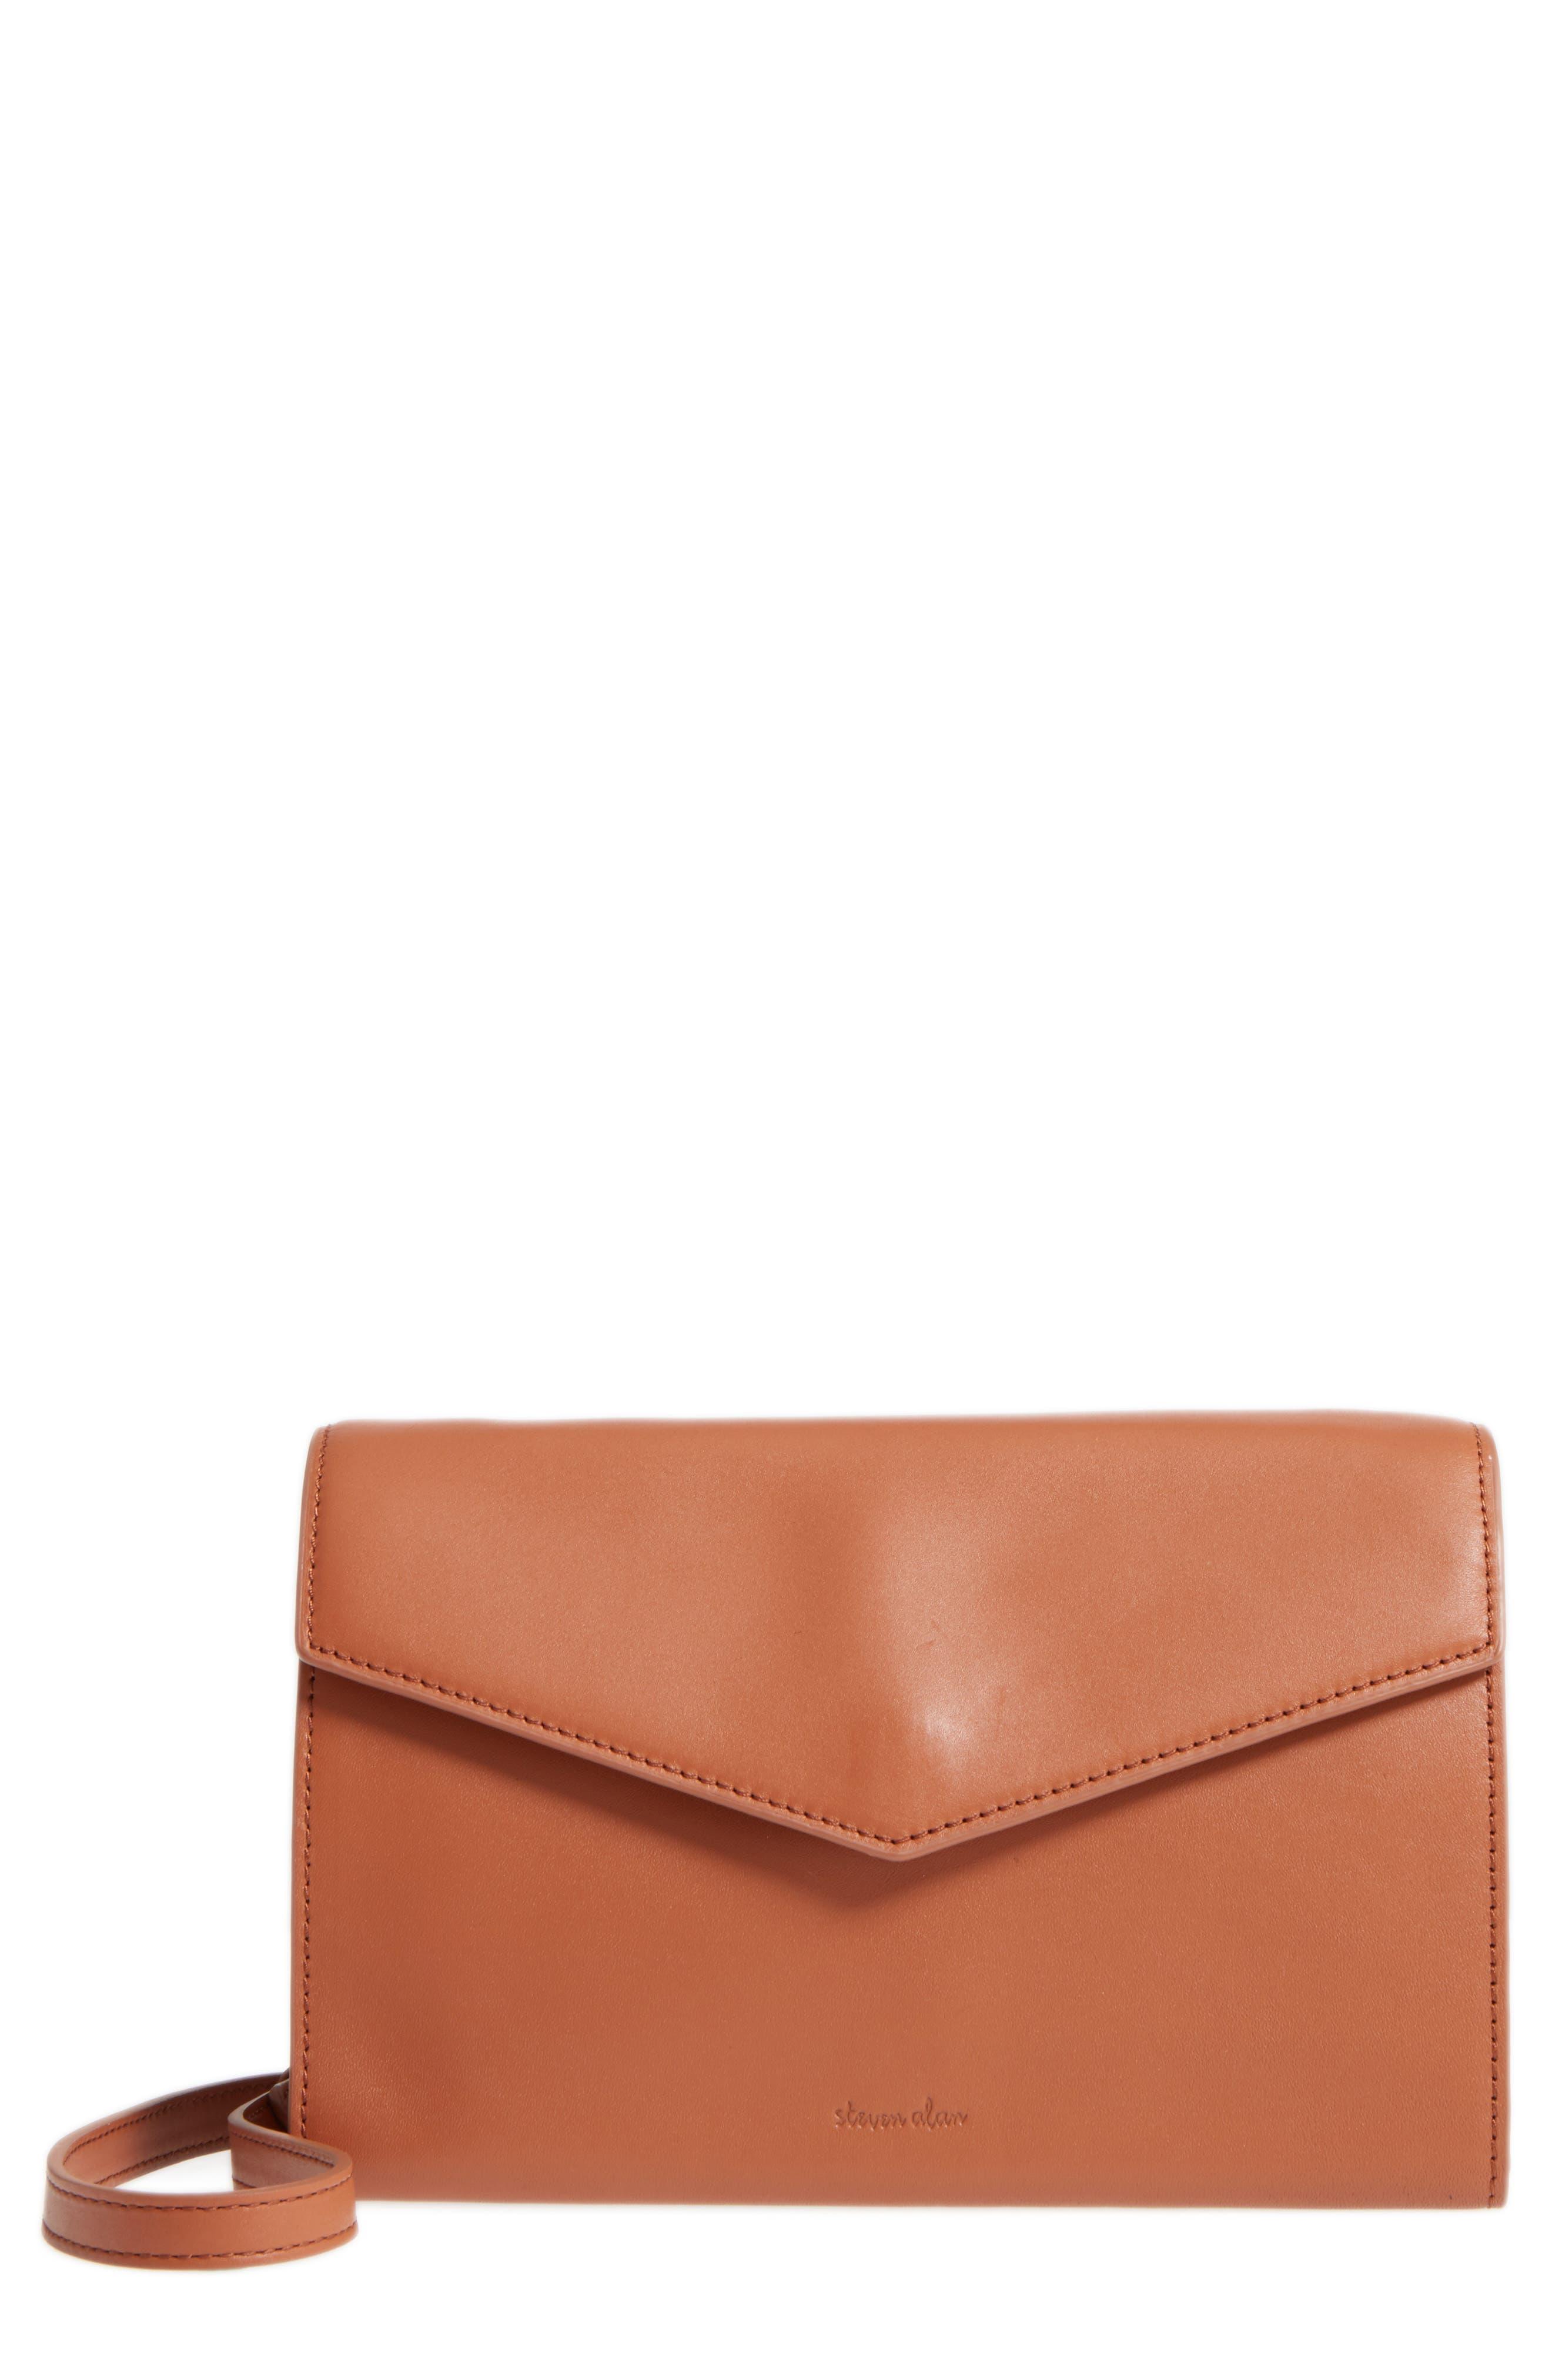 Easton Leather Envelope Crossbody Bag,                         Main,                         color, 200